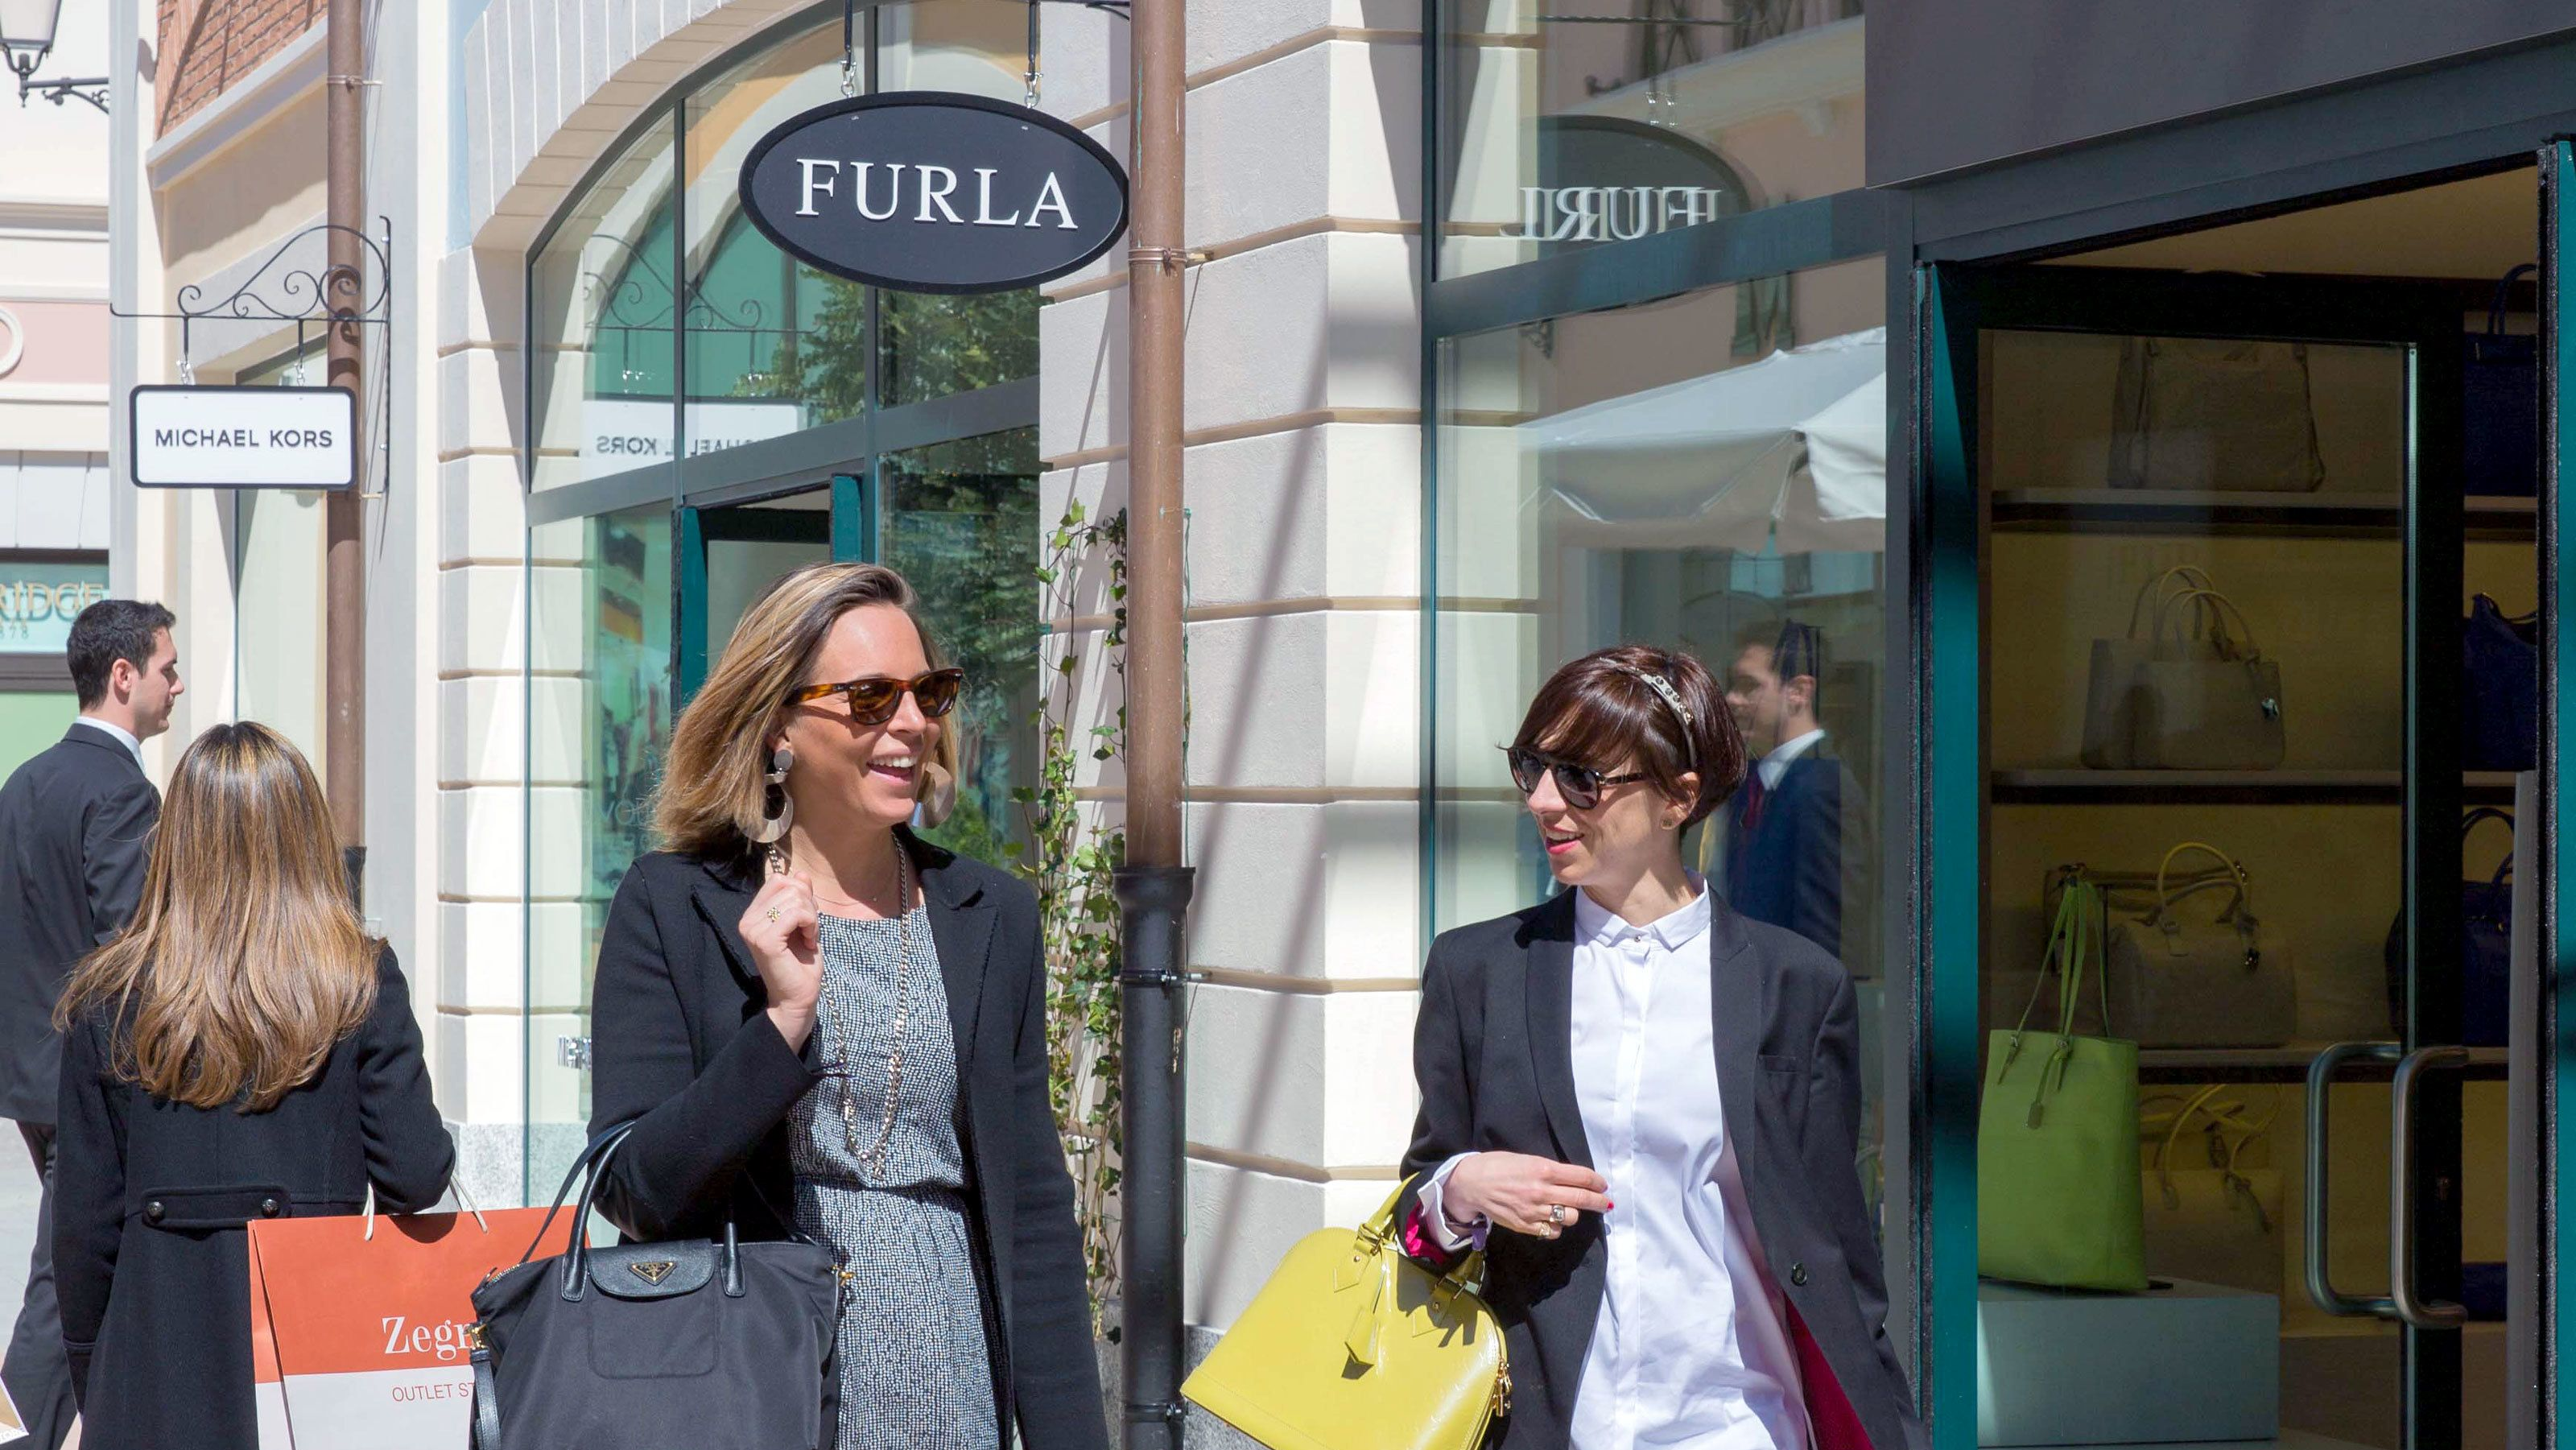 Women shopping at FoxTown near Milan